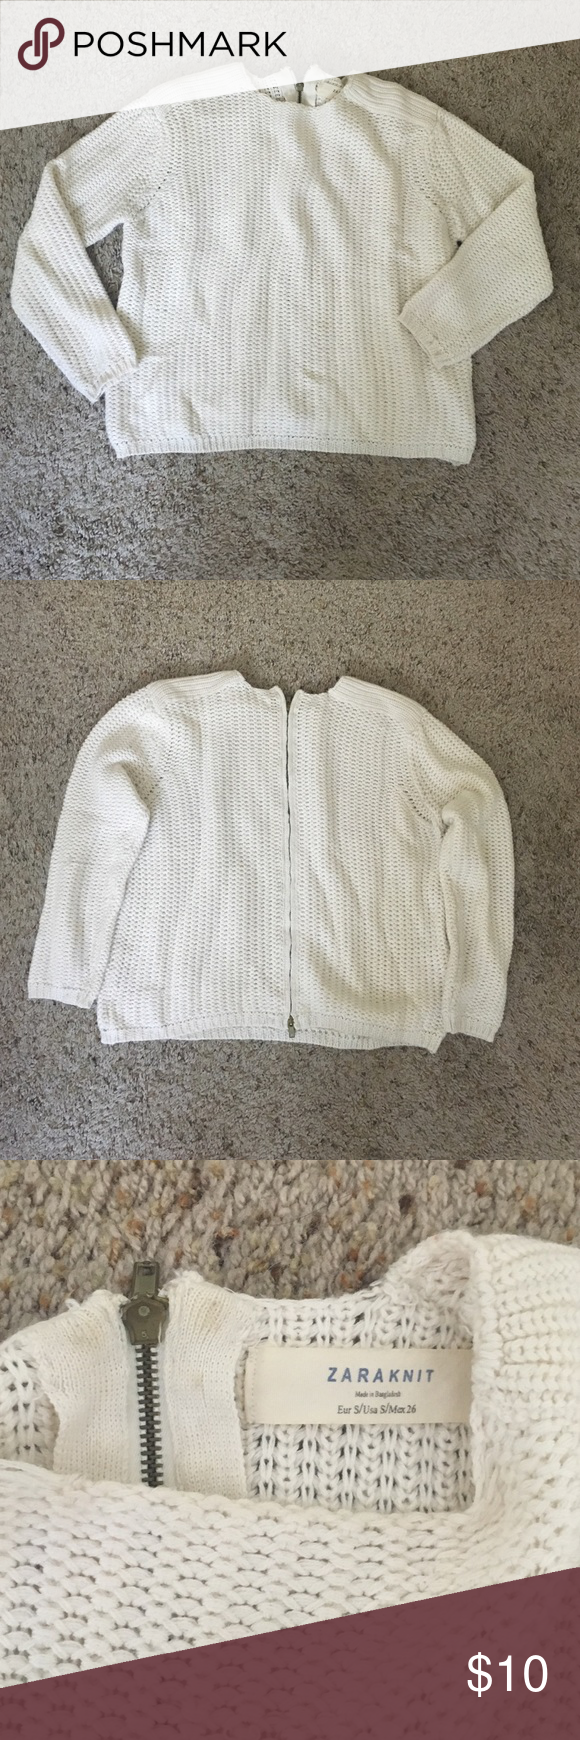 White Zara Sweater Gently used Zara box sweater- perfect for fall or winter! Zipper in back zips all the way down. Zara Sweaters Crew & Scoop Necks